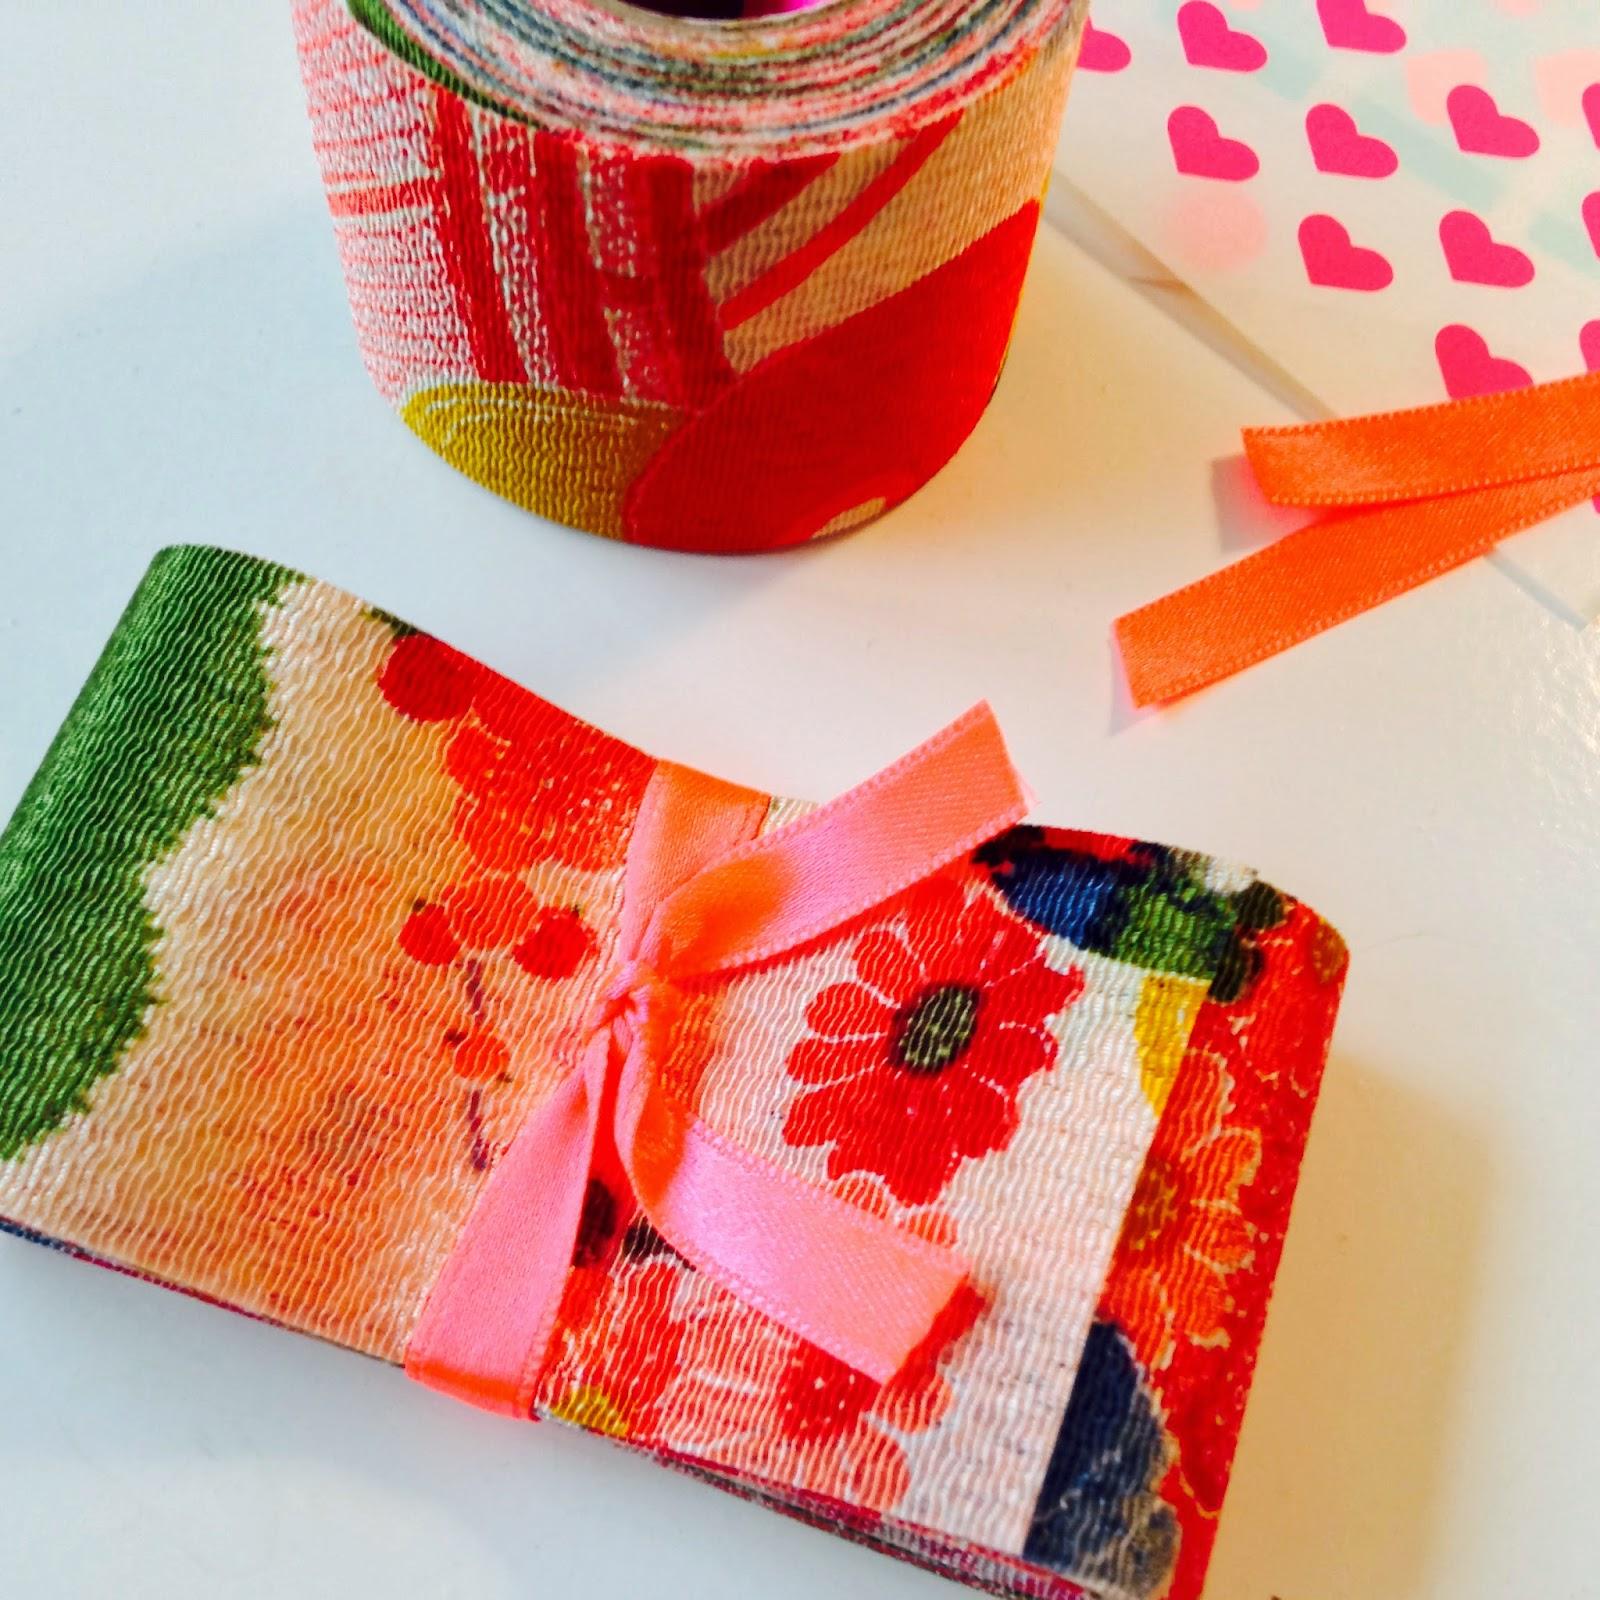 Kimono bånd fra Japan i skønne farver